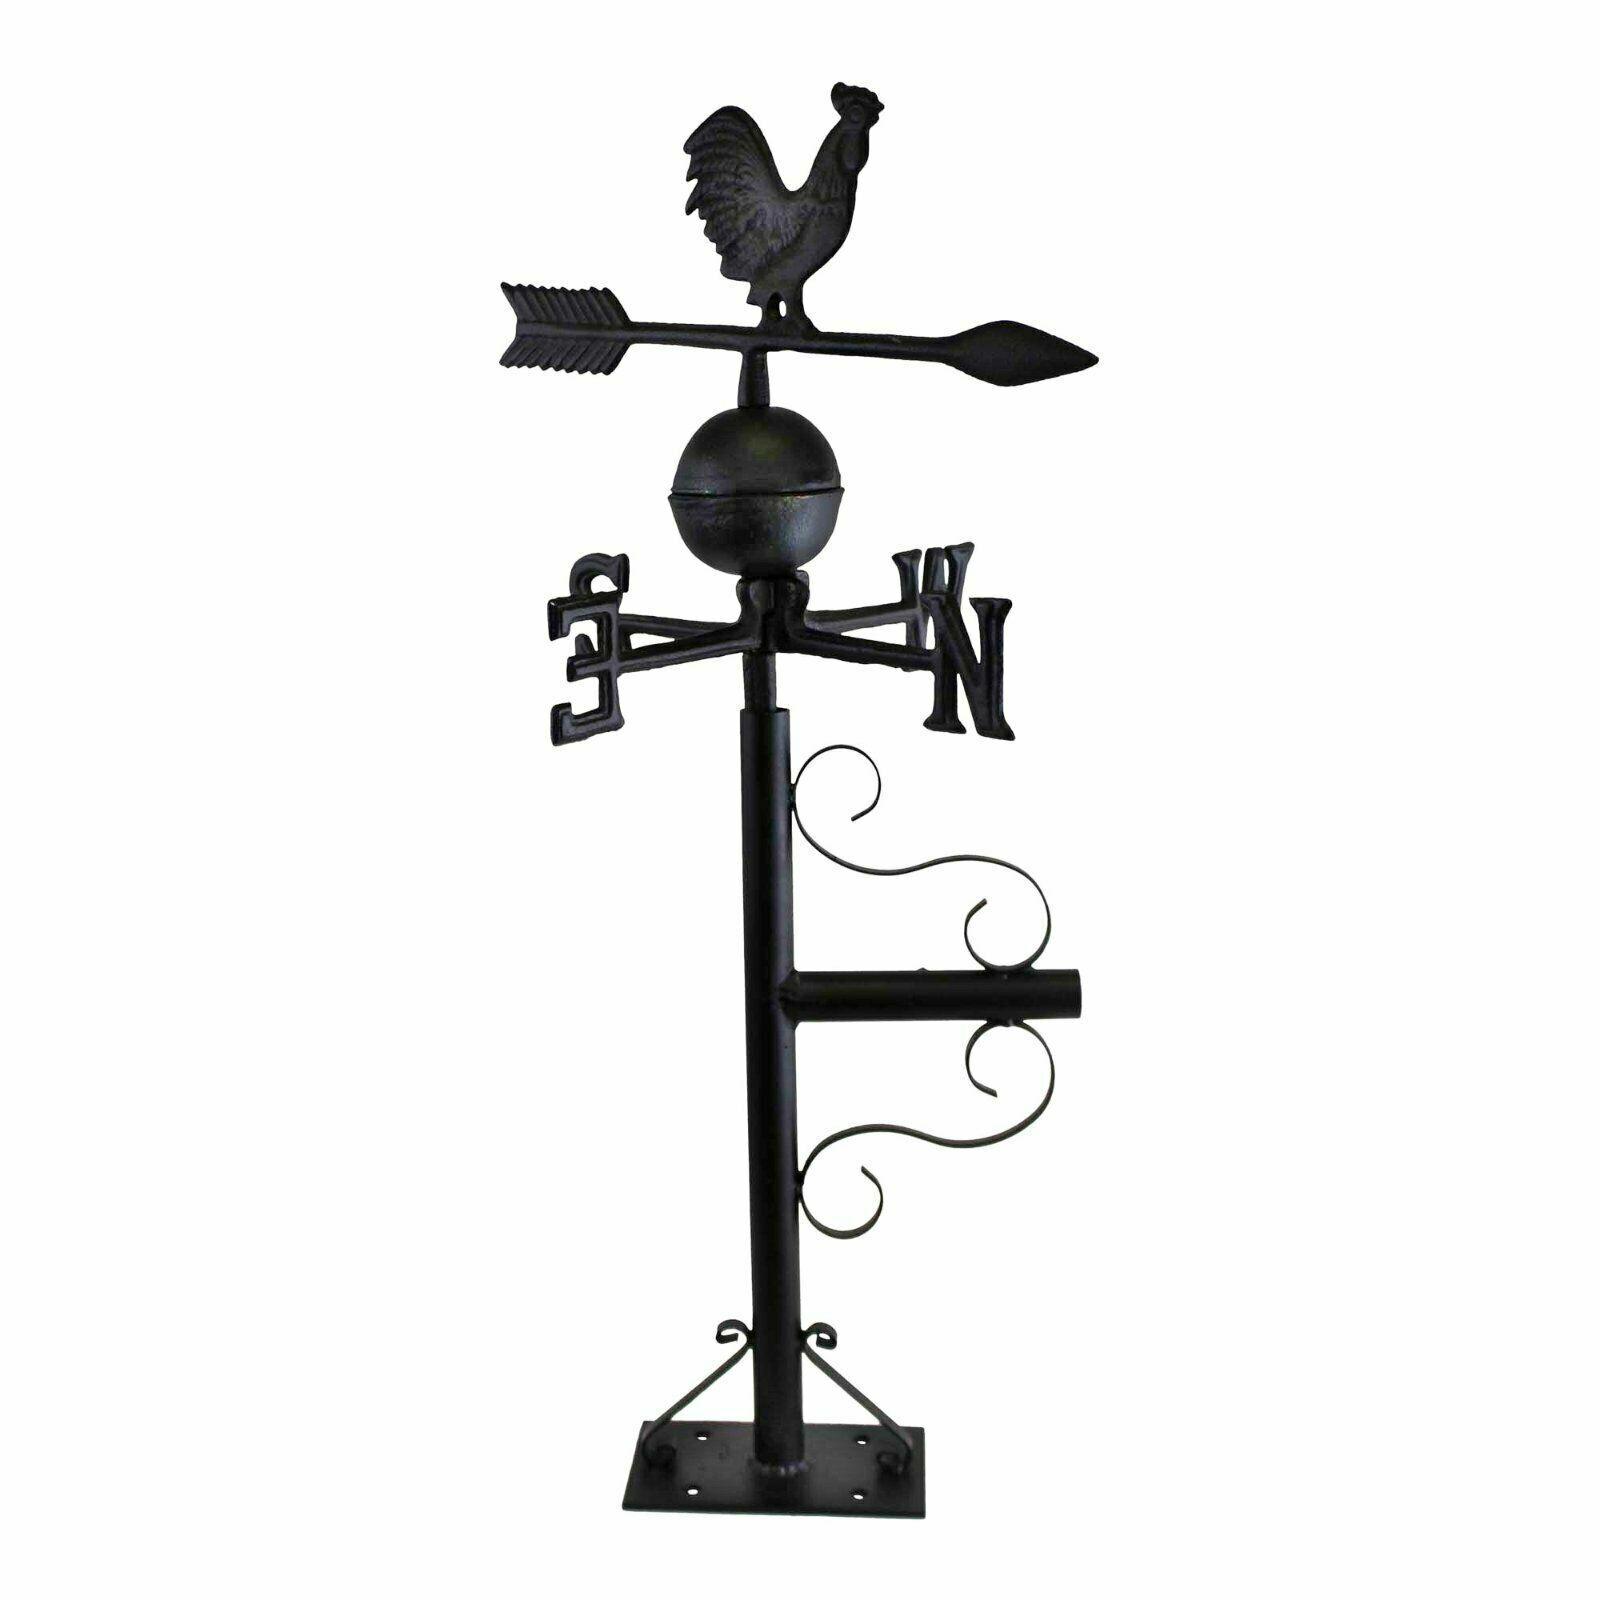 Rooster Design Cast Iron Large Weather Vane Mountable Garden Decor Metrology